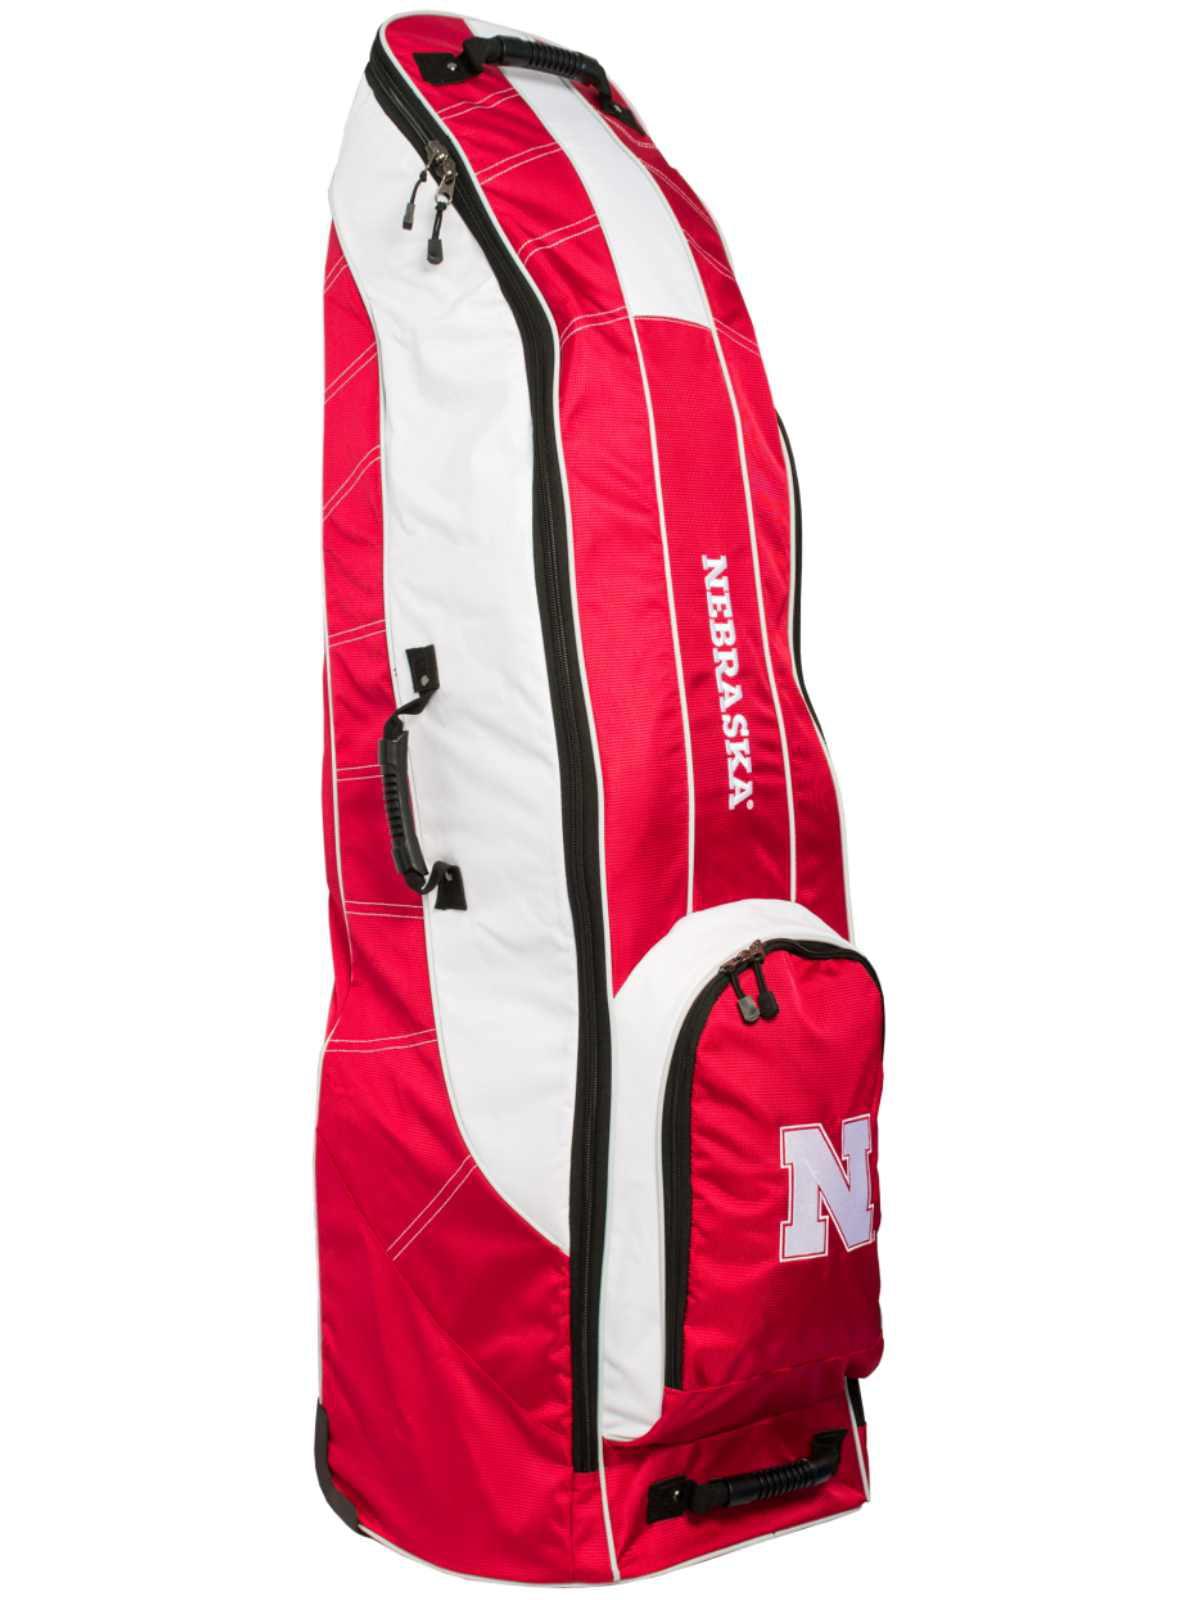 Nebraska Cornhuskers Team Golf Red Golf Clubs Wheeled Luggage Travel Bag by Team Golf